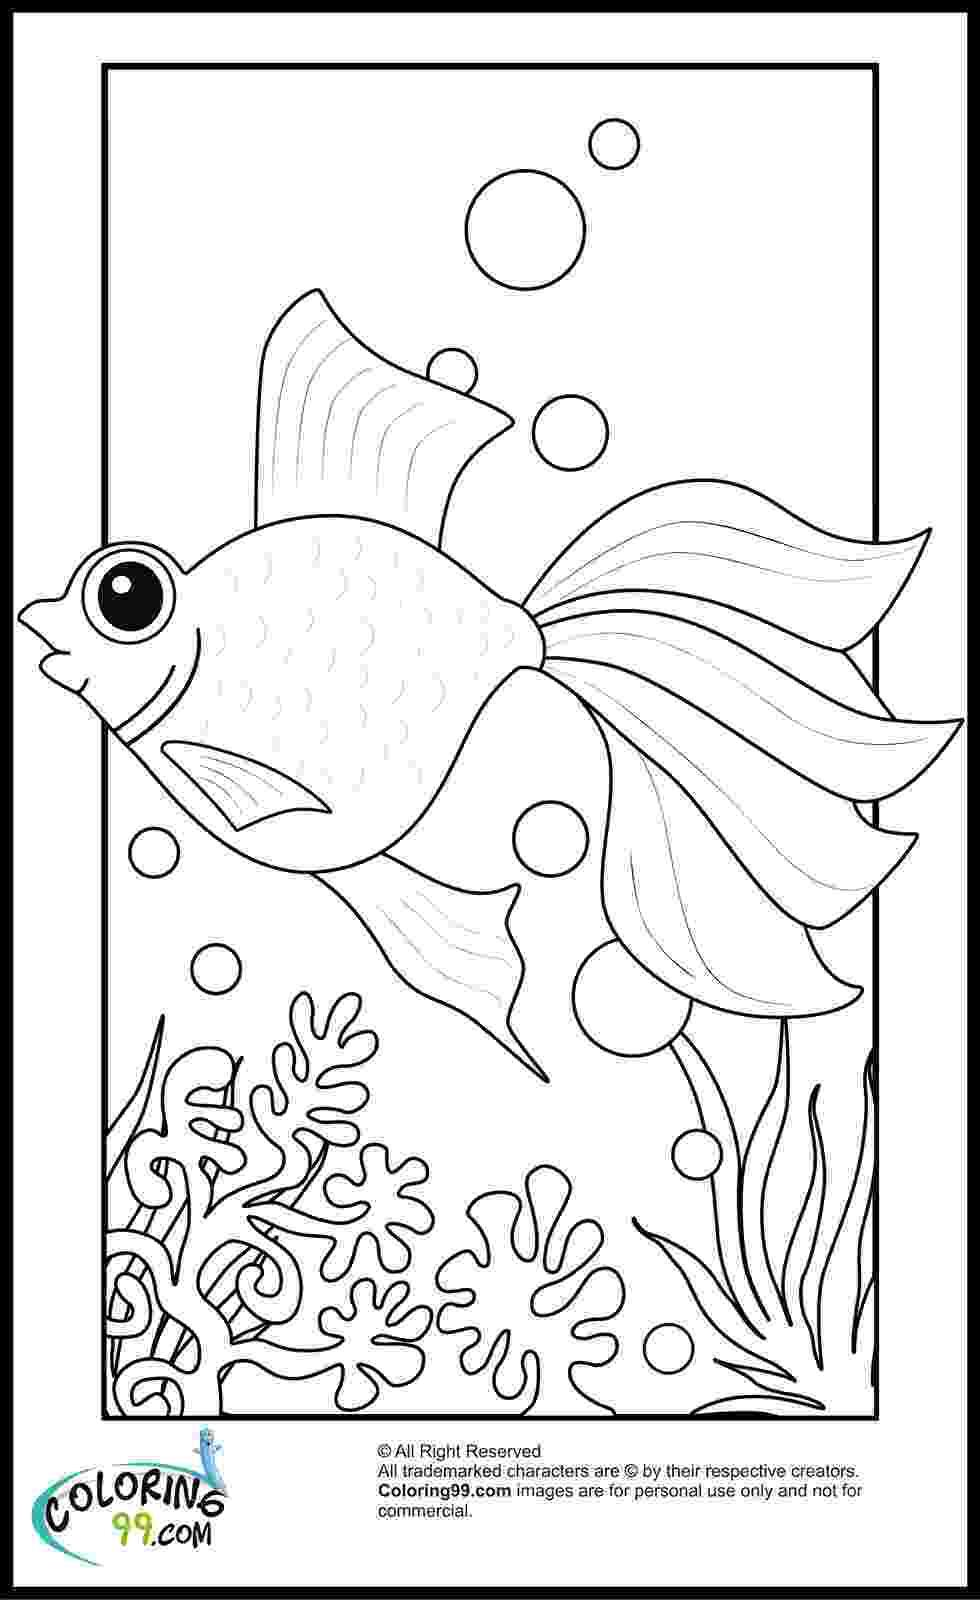 goldfish coloring page goldfish coloring pages getcoloringpagescom coloring page goldfish